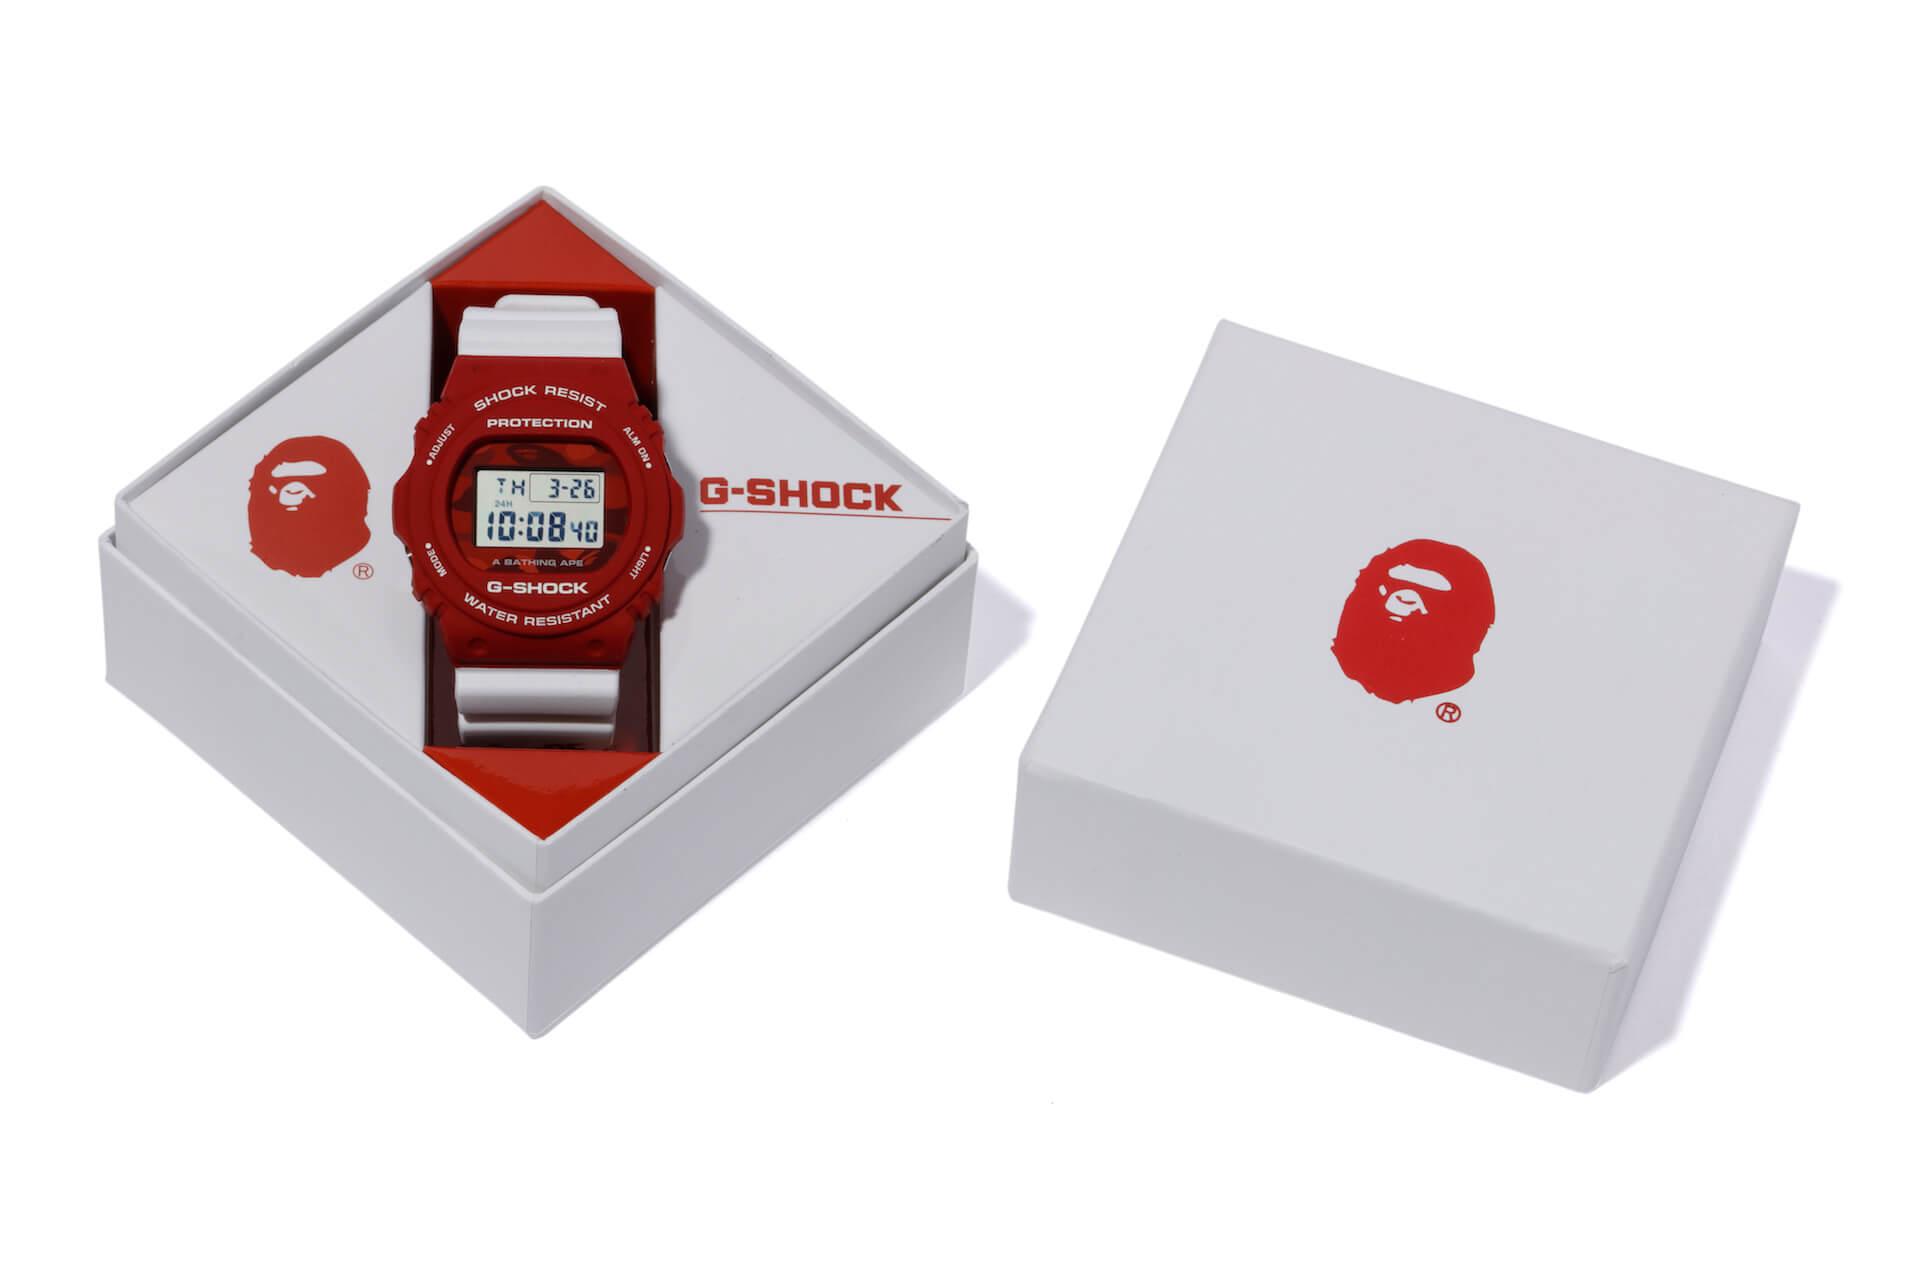 G-SHOCK「DW-5750」がA BATHING APE(R)カラー一色に!新型コラボモデルが登場 life200318_gshock_bape_5